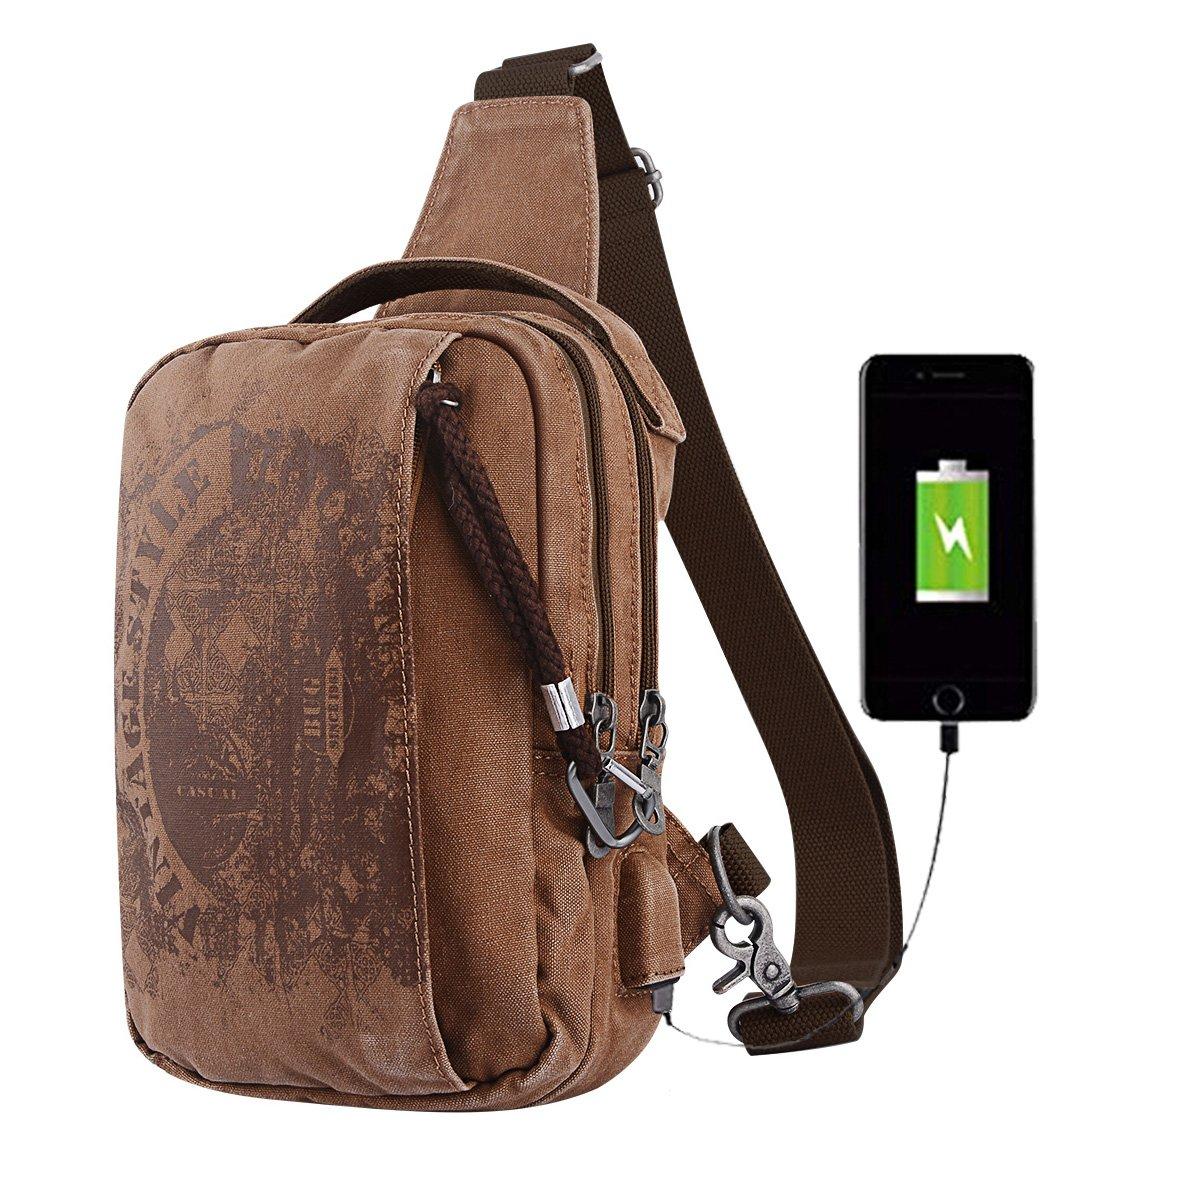 5ae12cdad4dd Amazon.com  Sling Backpack Anti-Theft Canvas Bag One Strap Crossbody  Shoulder Travel Sport Hiking Daypacks for Men Women USB Charging  Port(Khaki)  Sports   ...